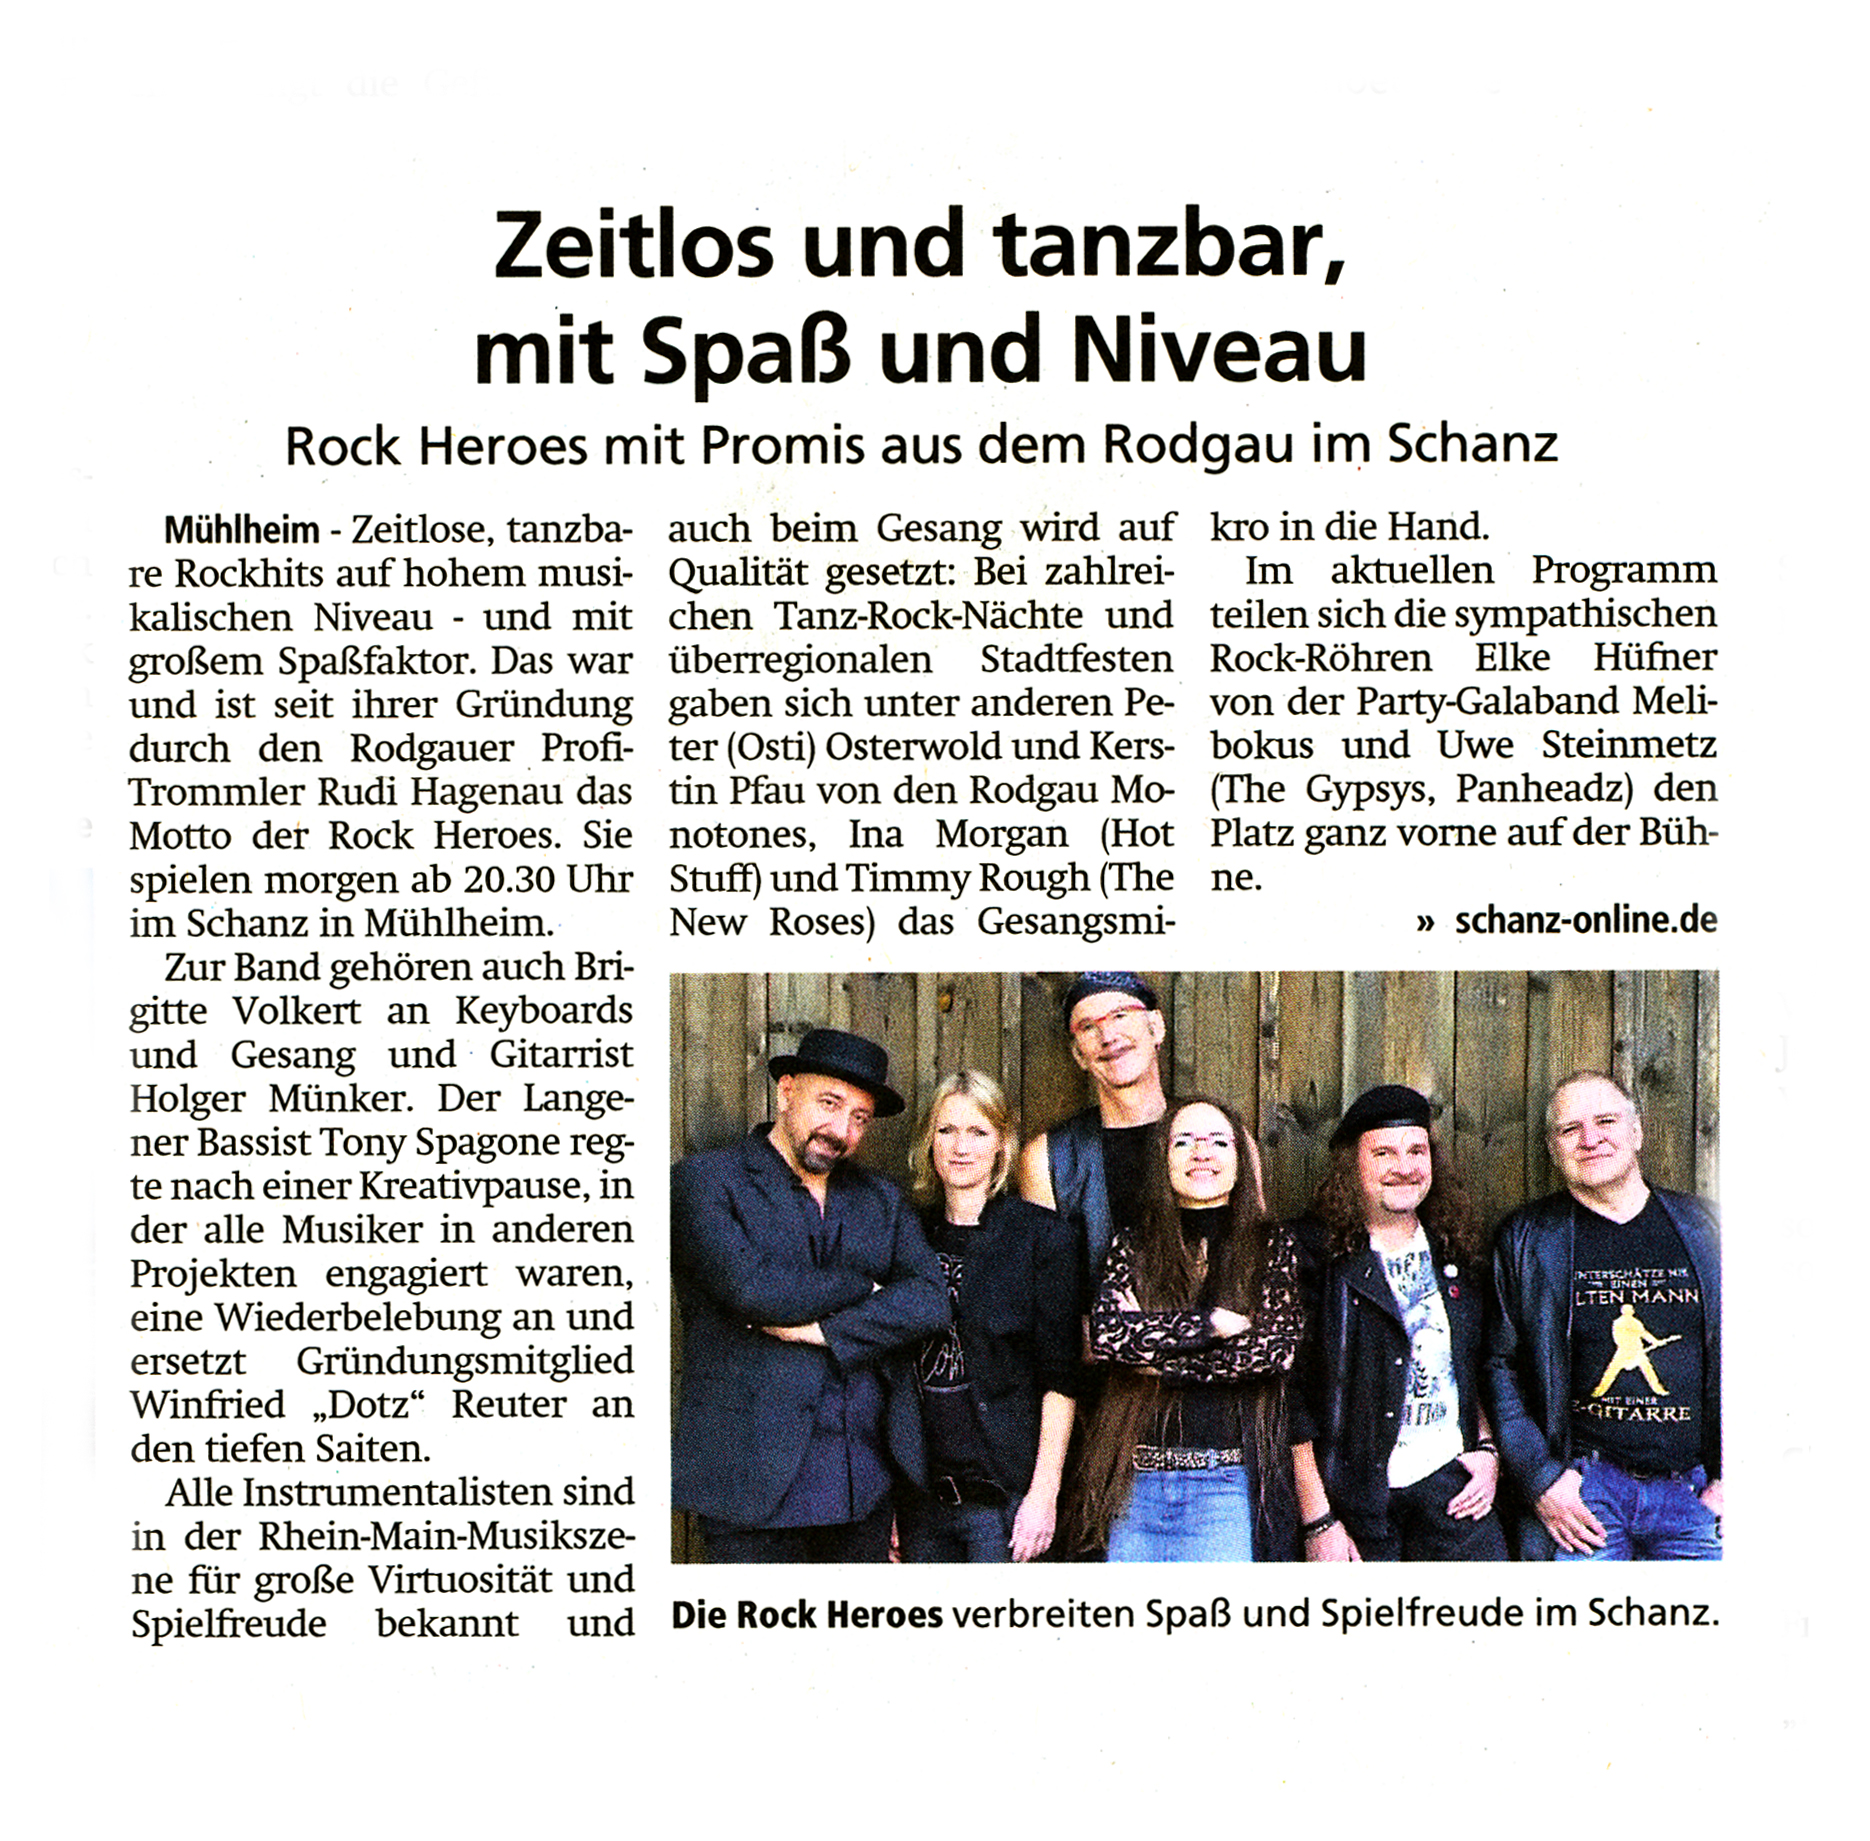 Offenbach Post, 26. September 2019